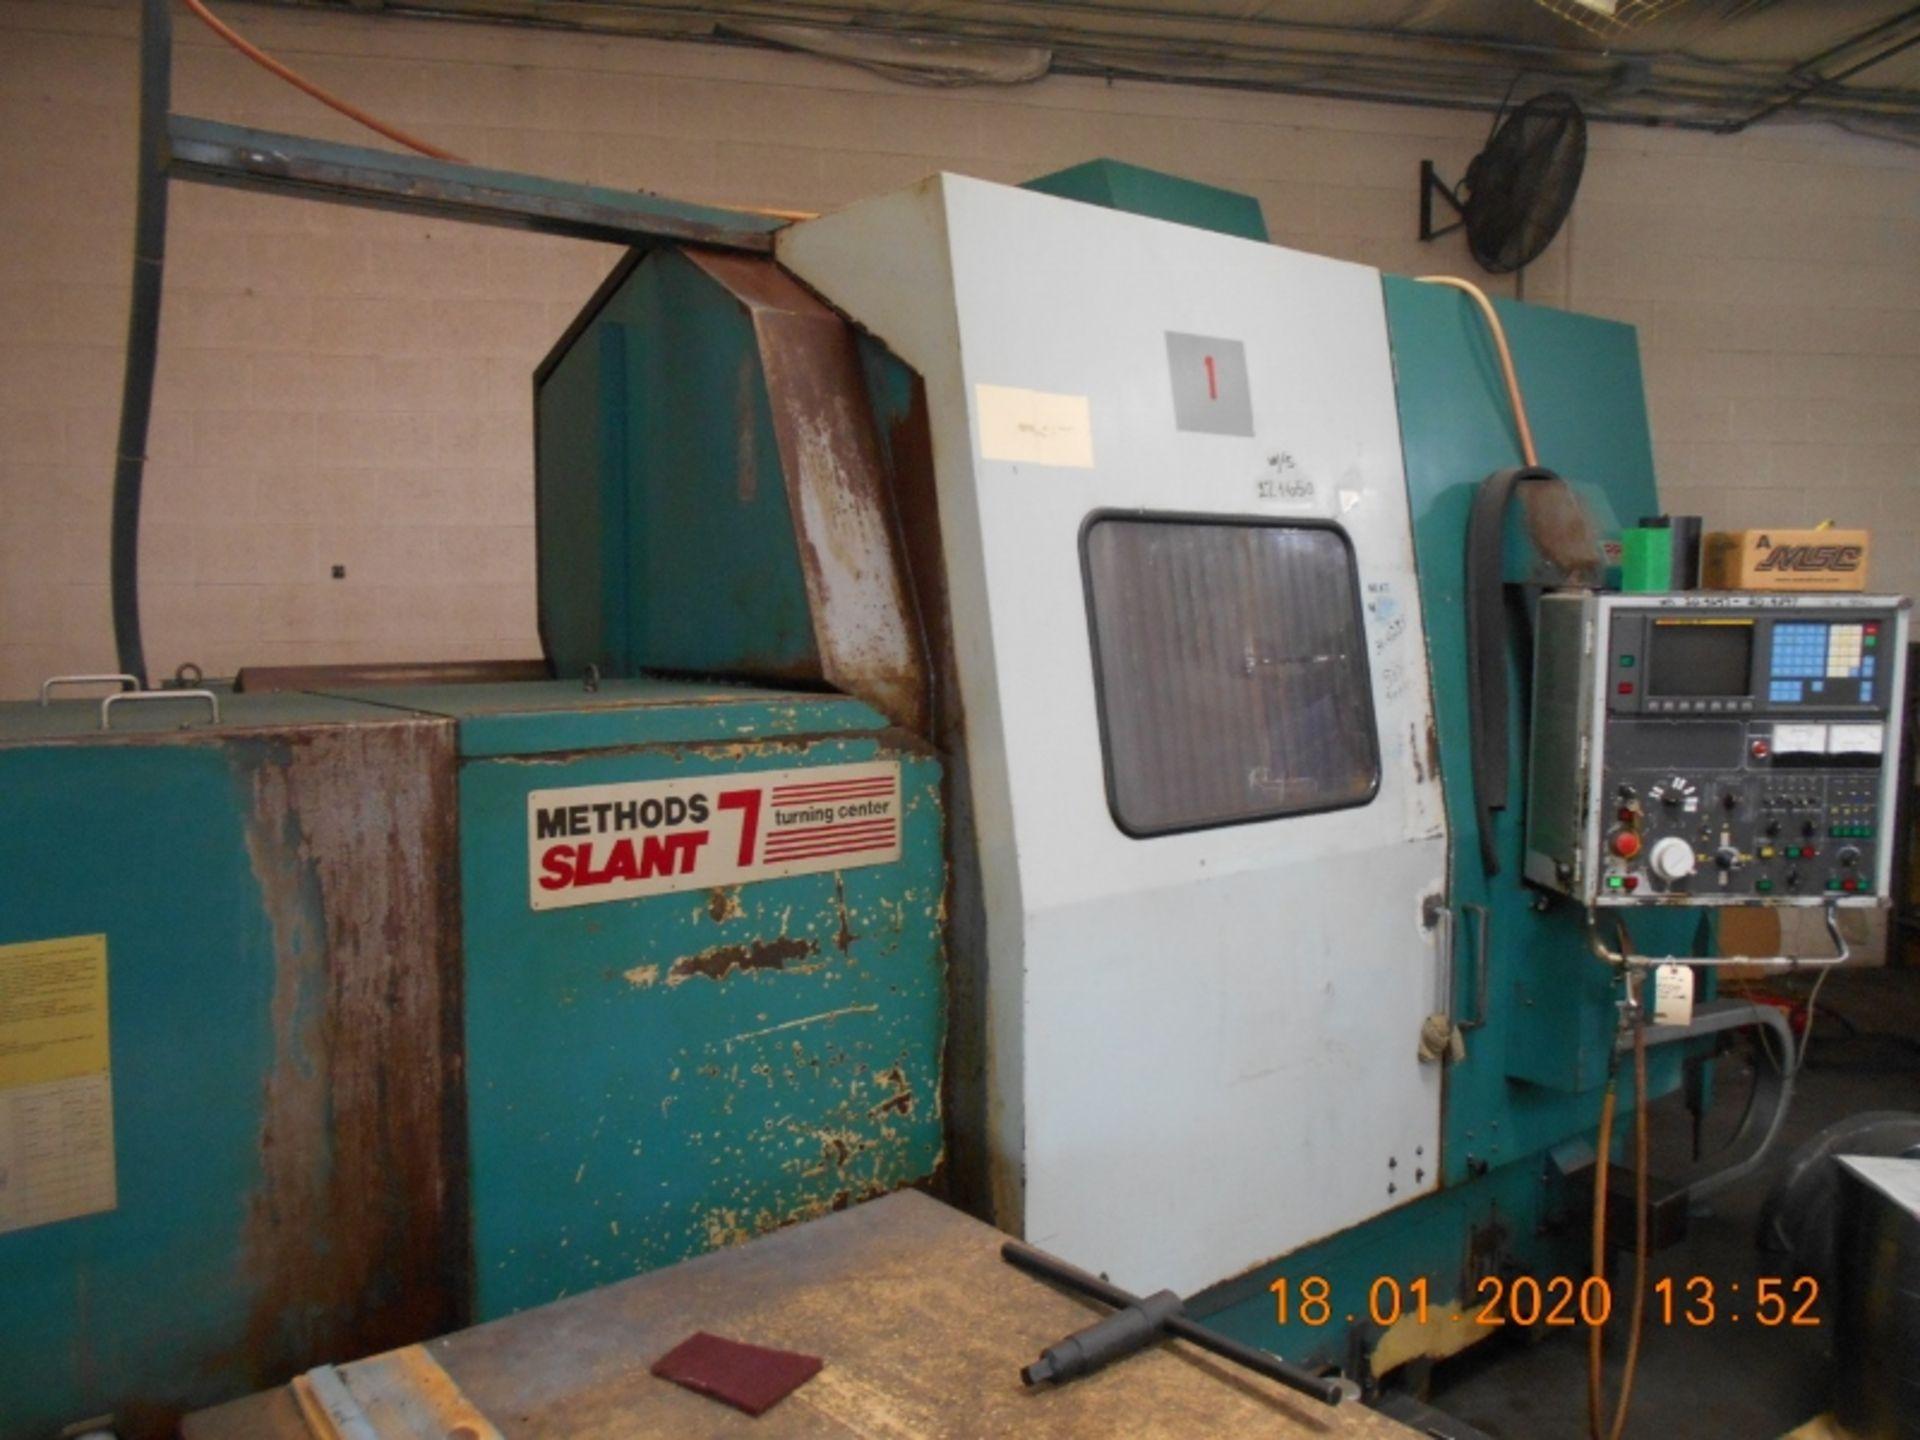 Lot 16 - Nakamura Slant 7 CNC Lathe Fanuc 15-T Controls